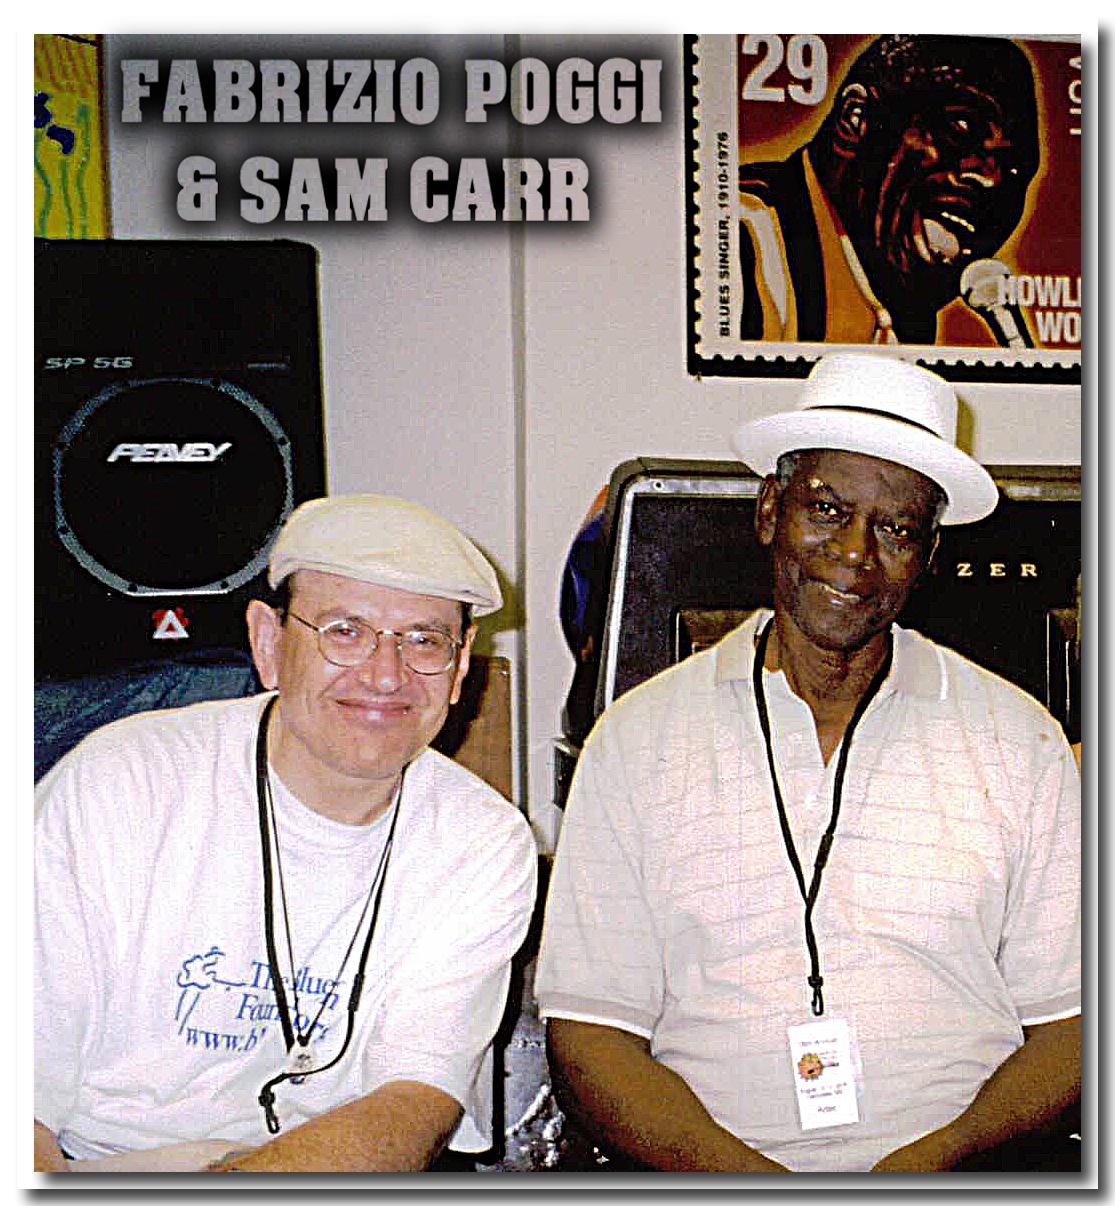 Fabrizio Poggi and Sam Carr - Clarksdale, Mississippi